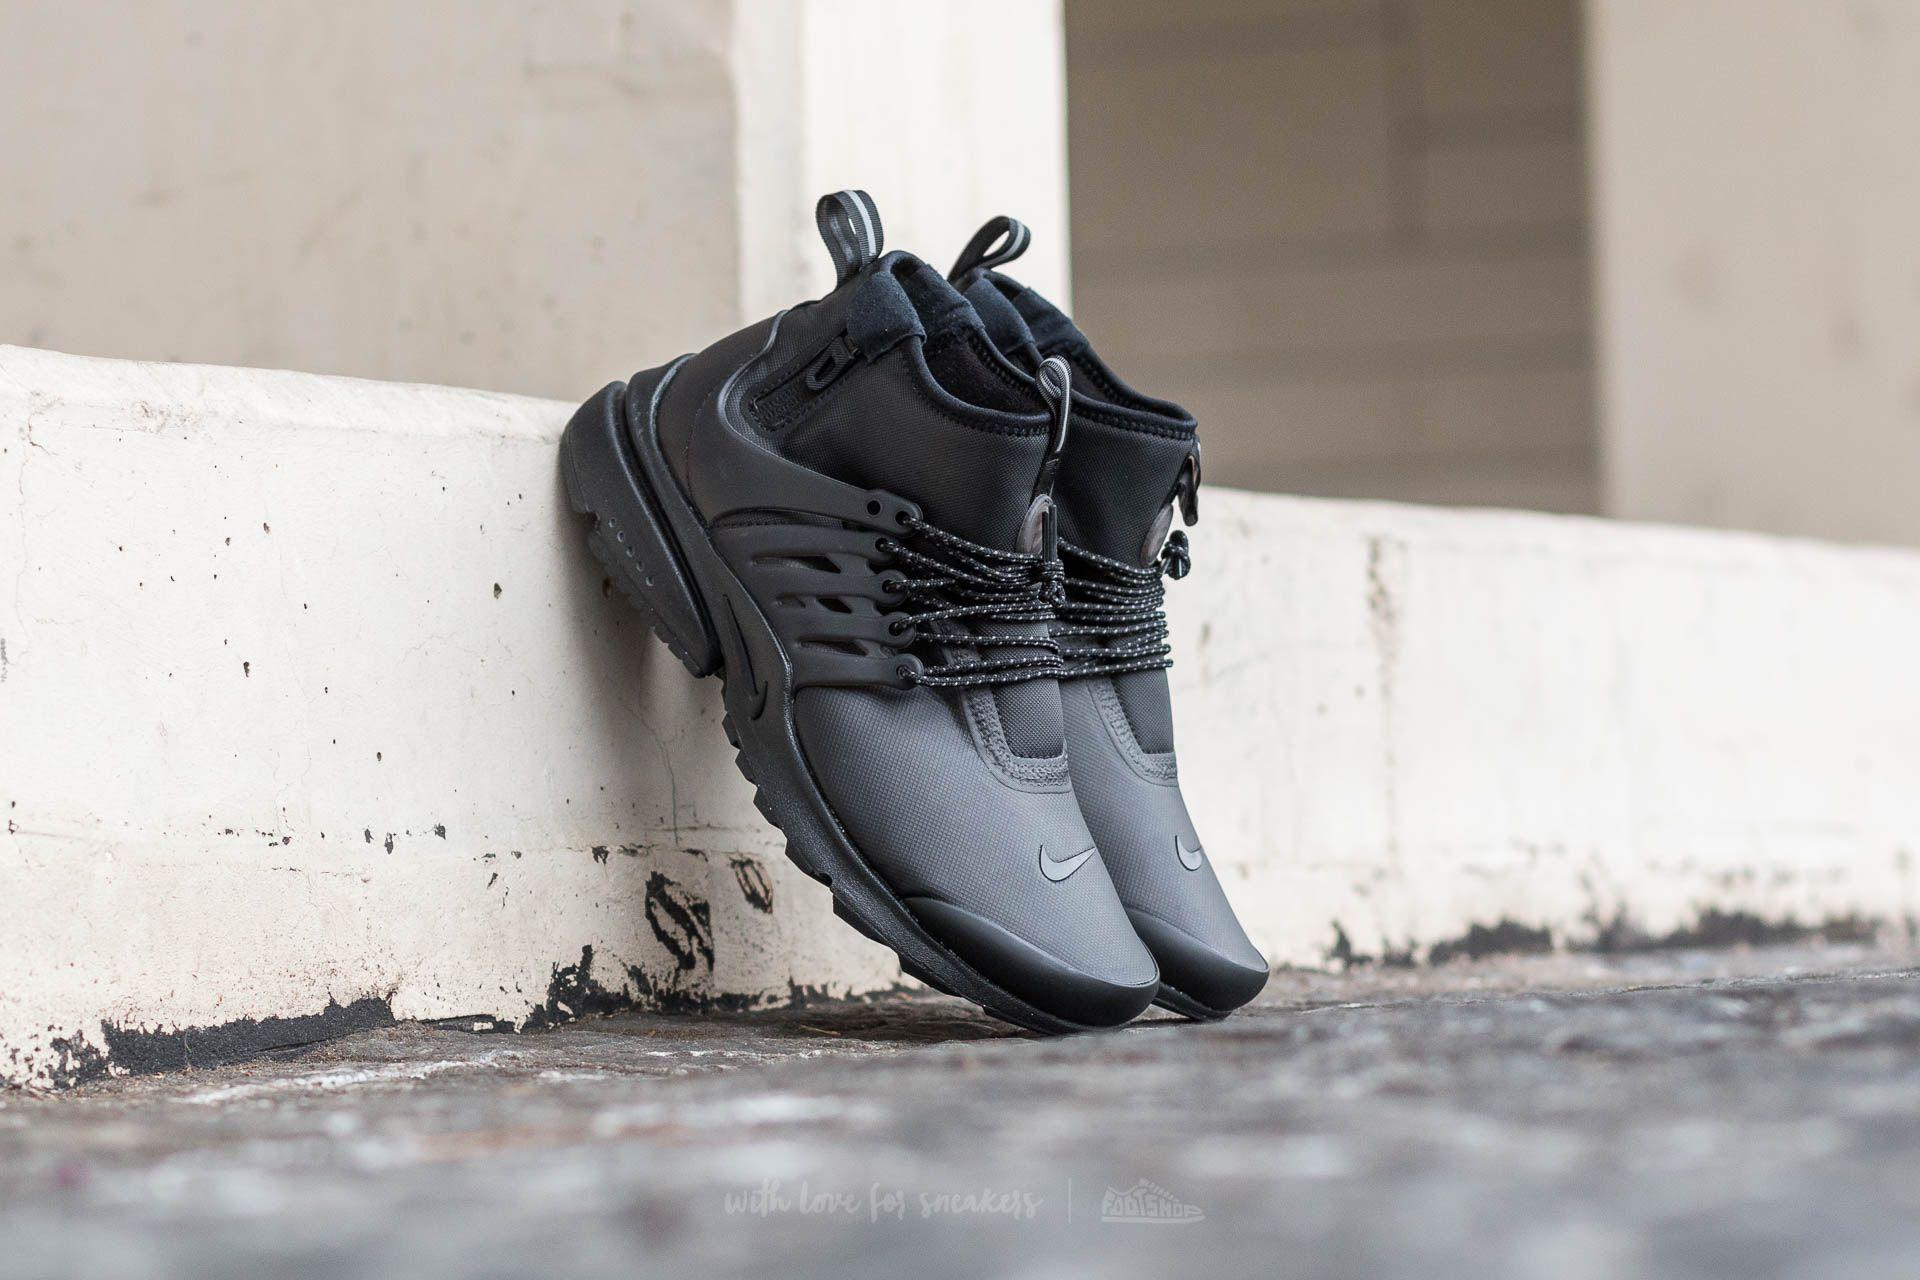 Nike Air Presto MID Utility Black/ Black-Volt-Dark Grey